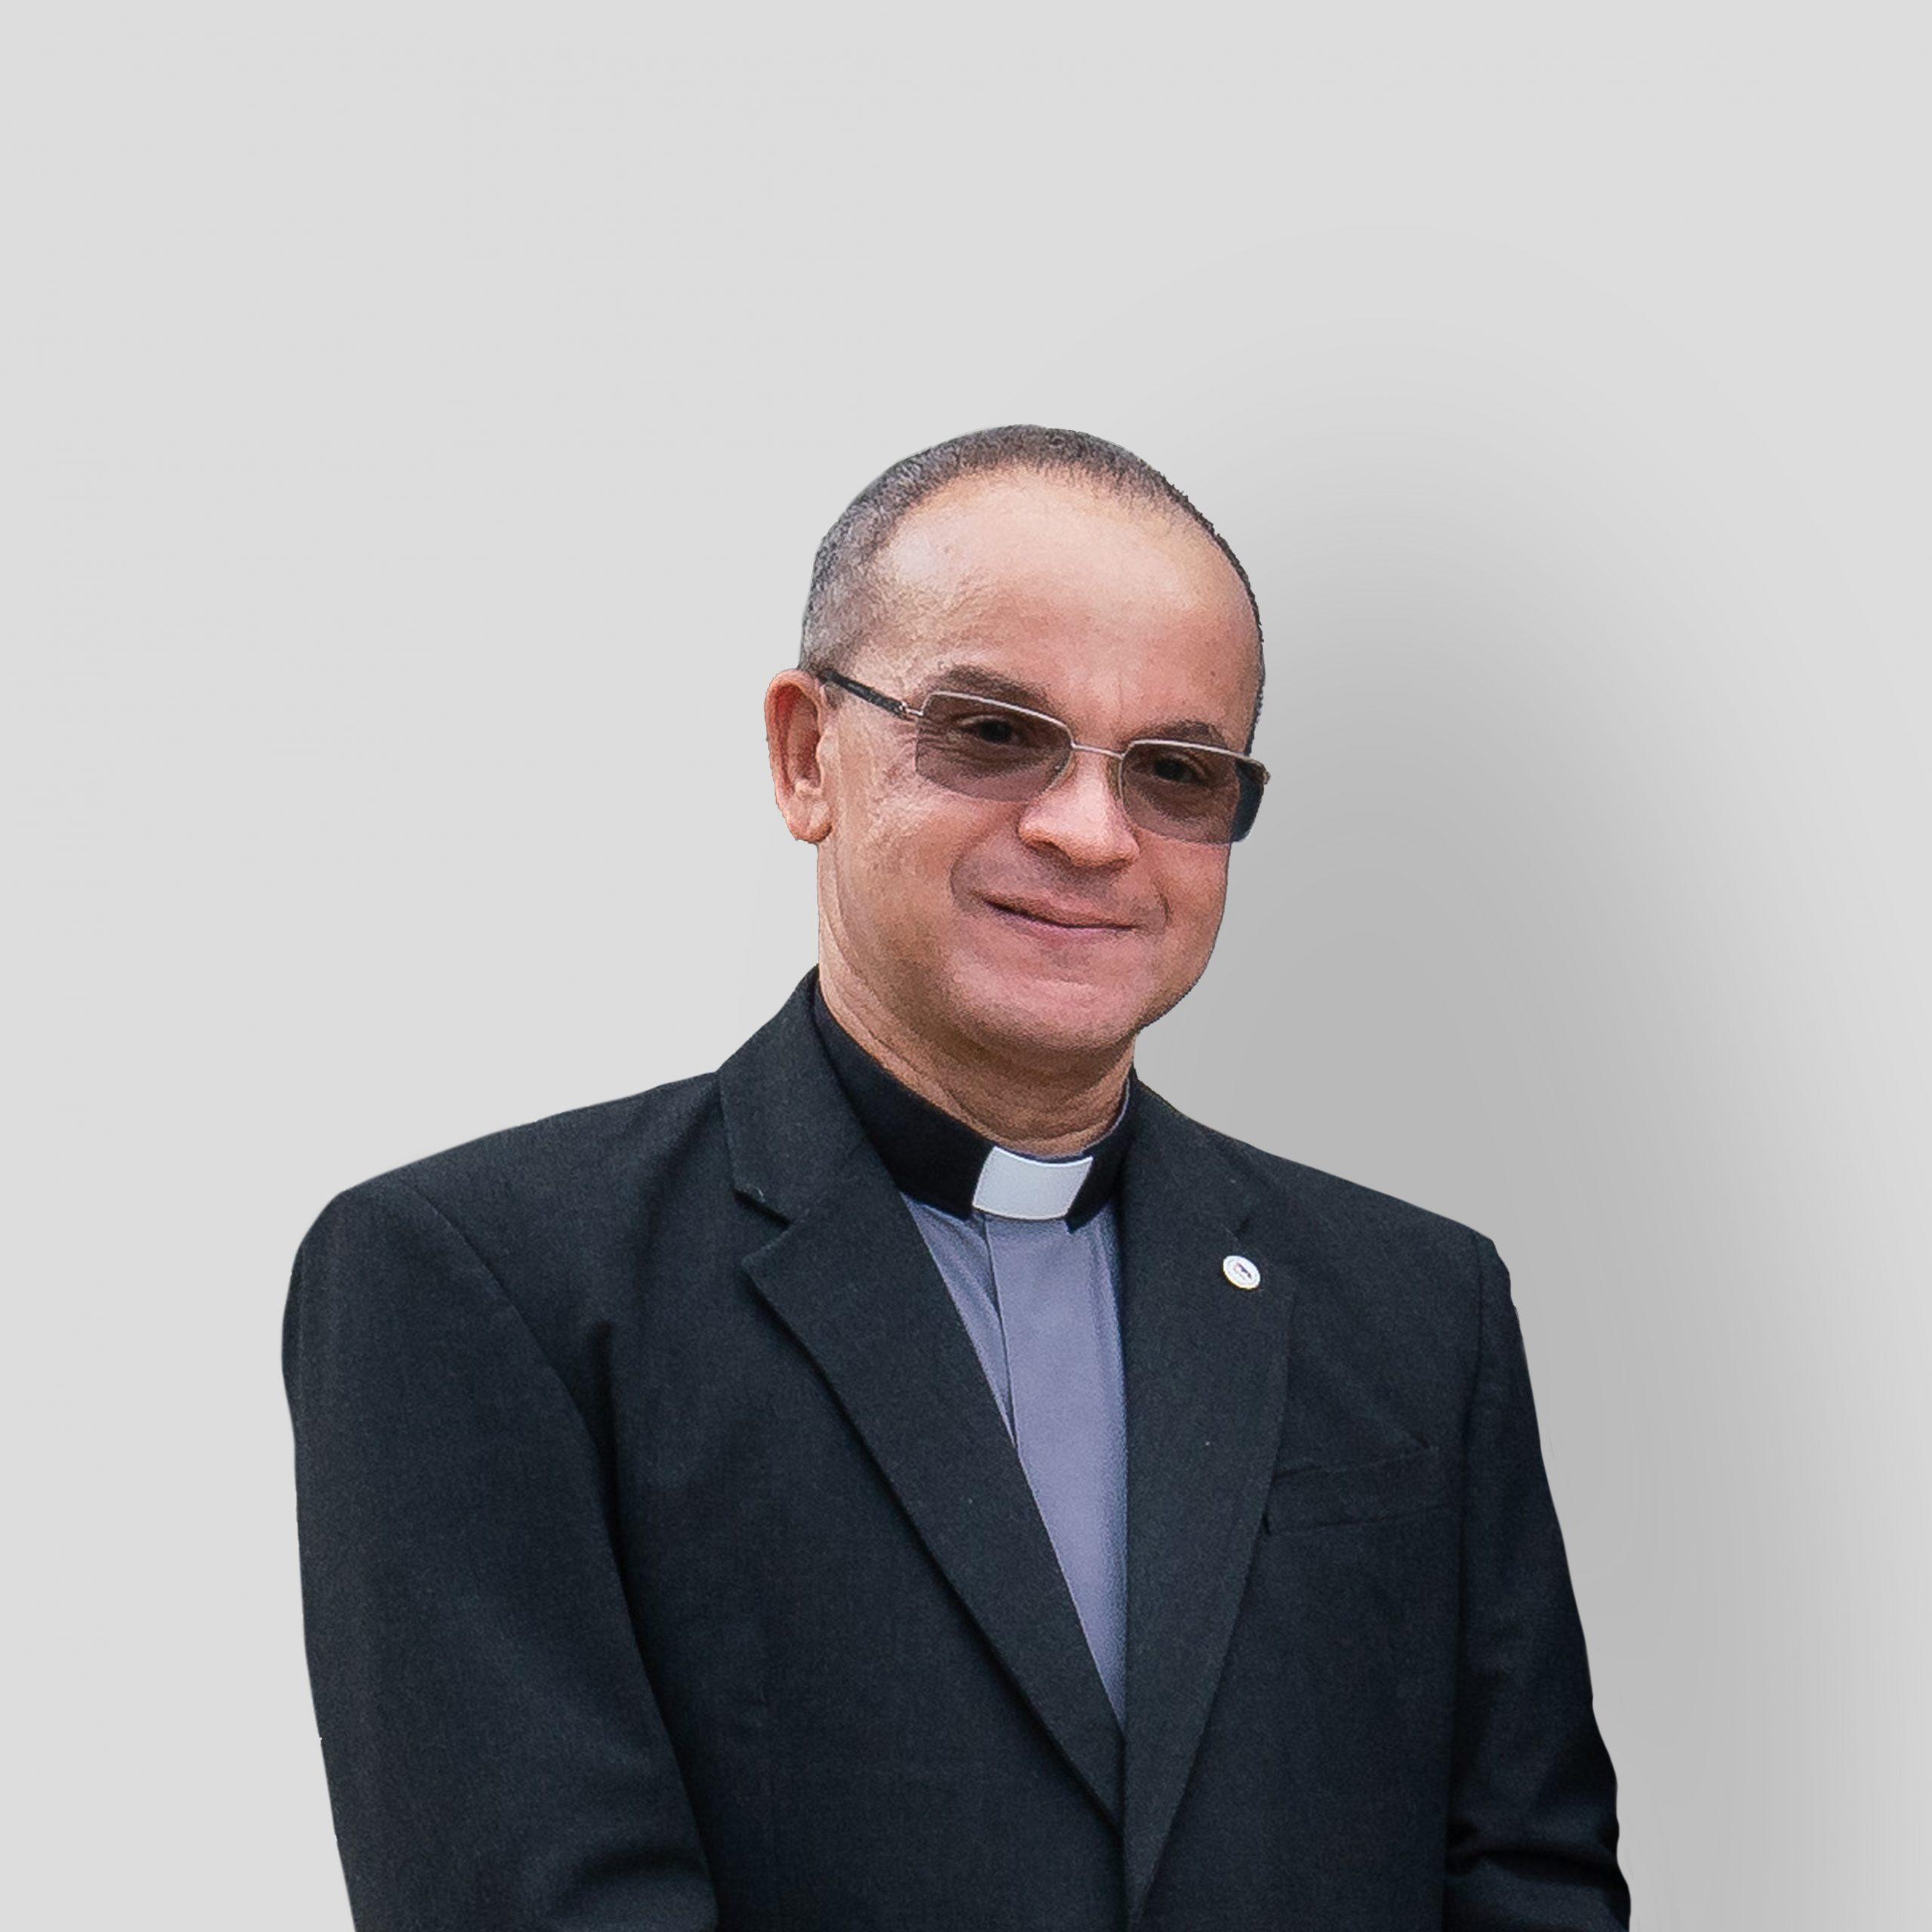 Alfredo De La Cruz Baldera